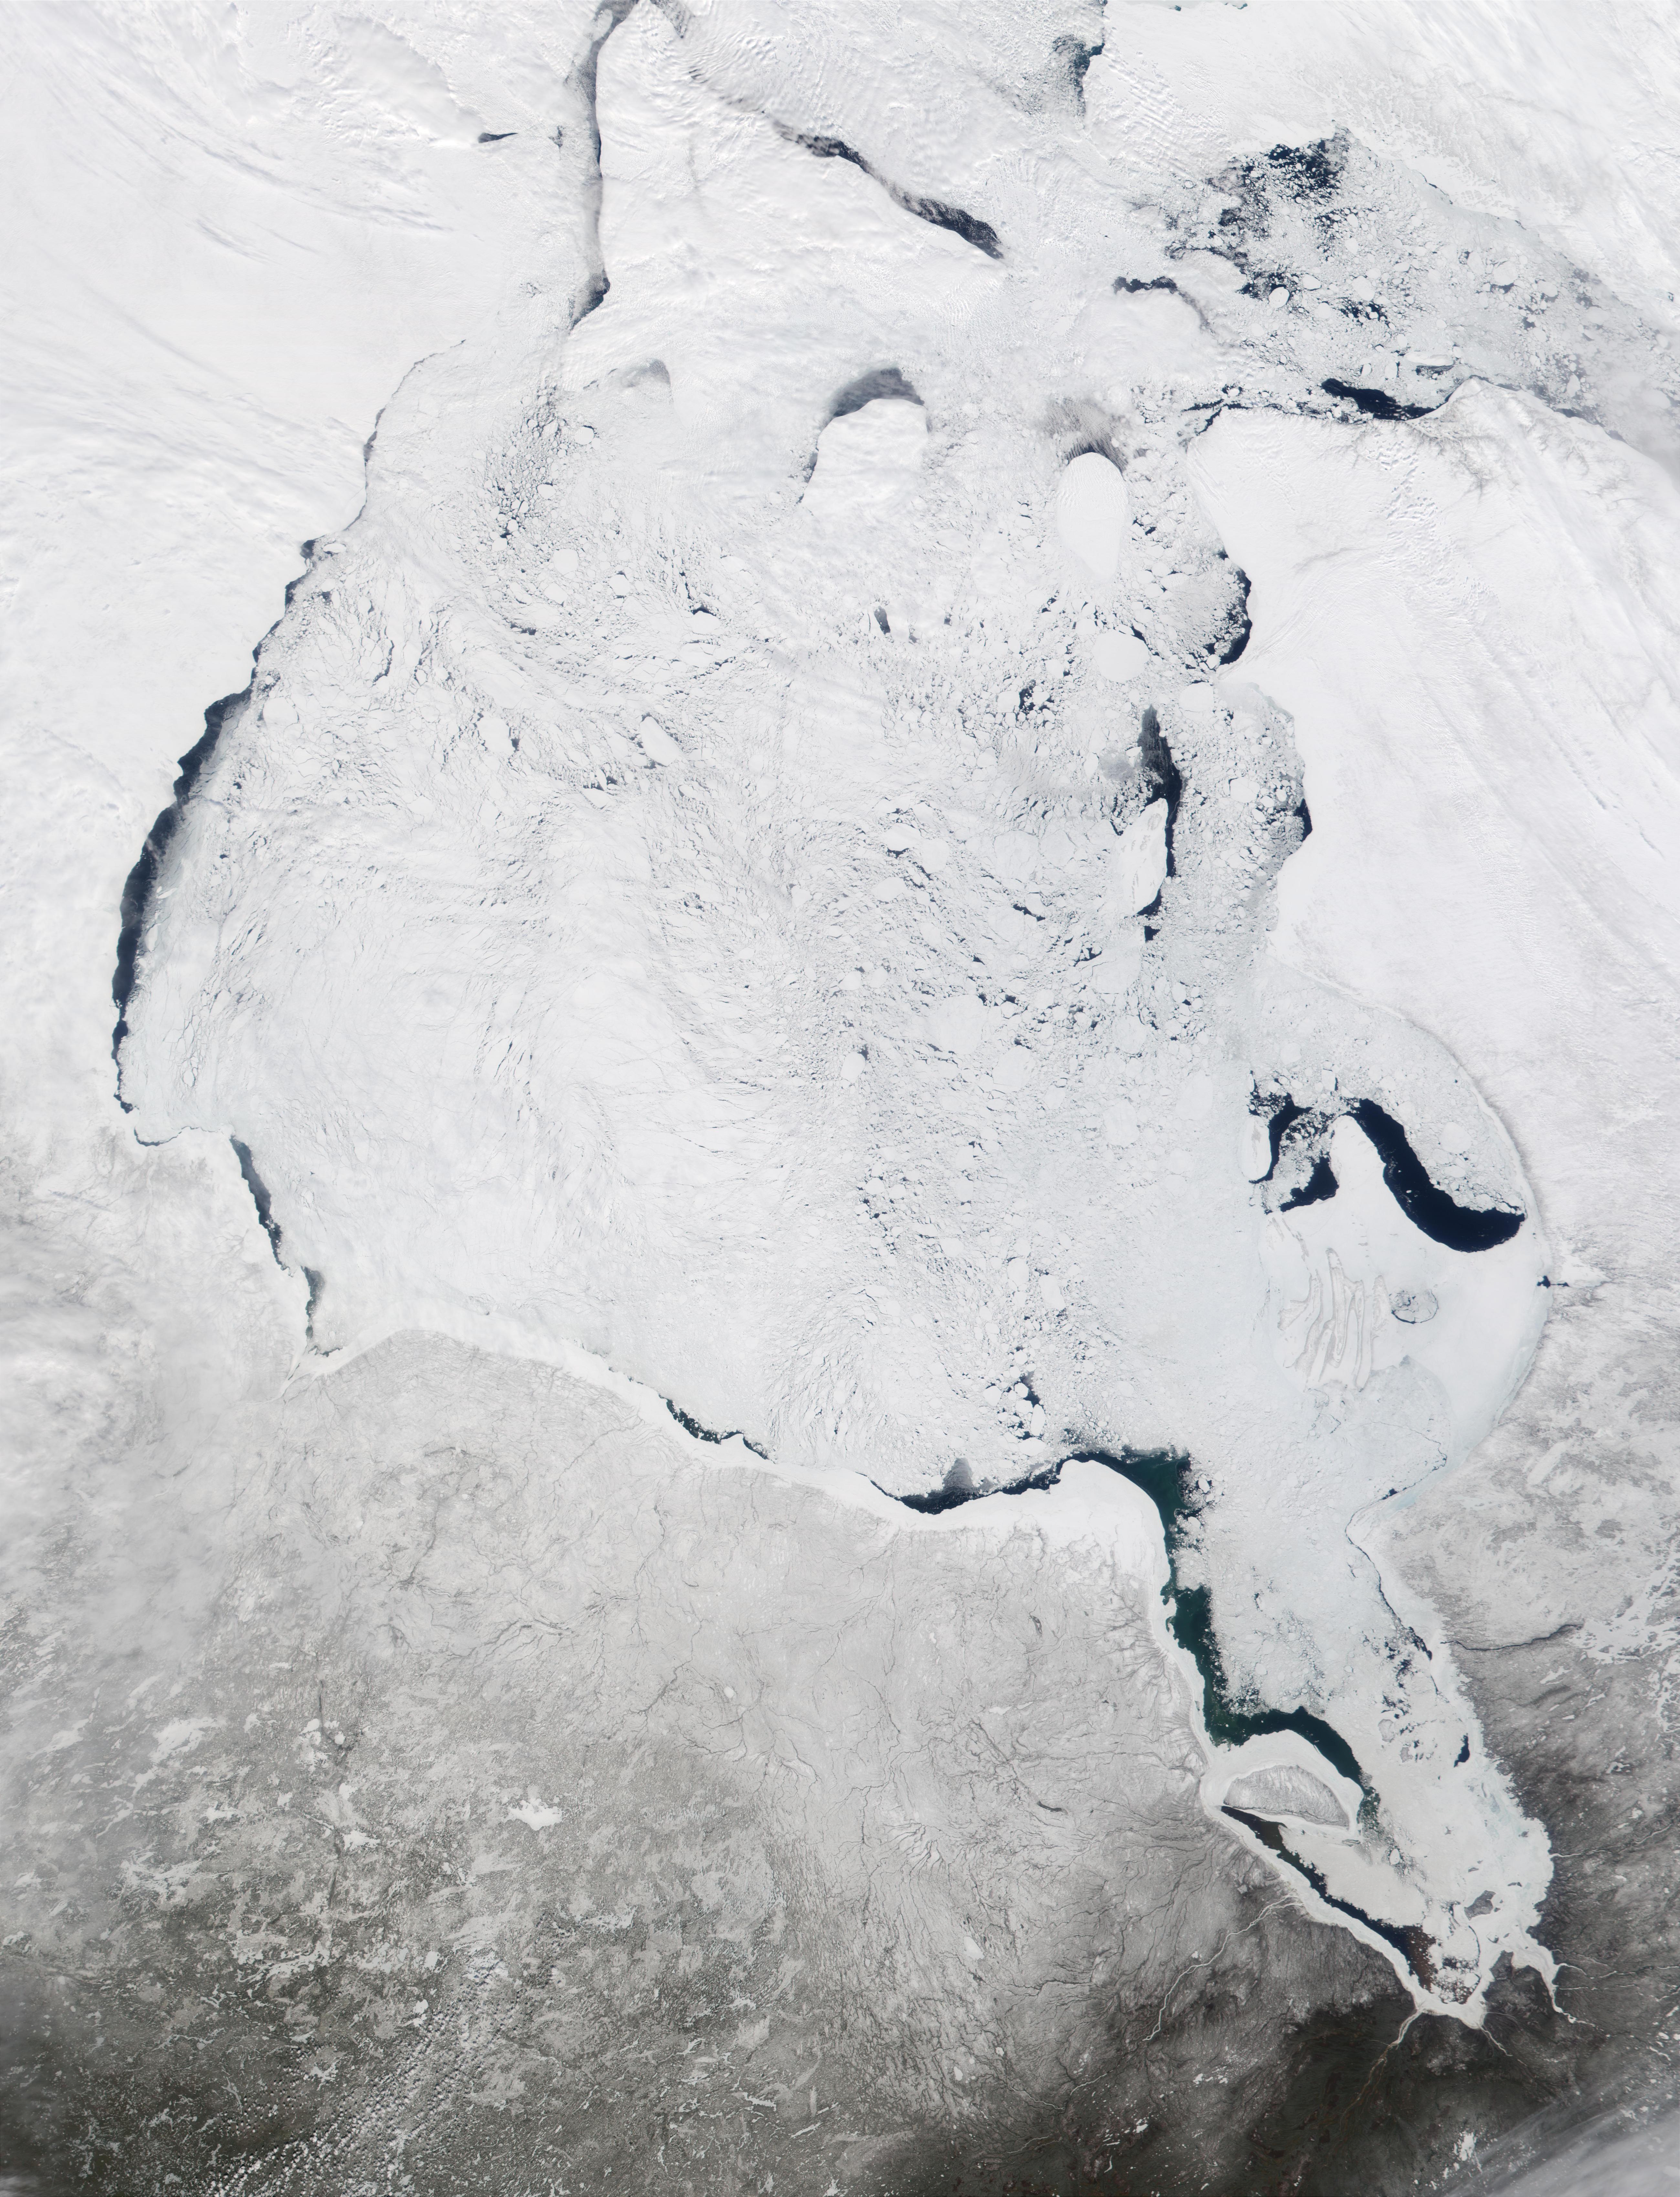 Bahía de Hudson, Canadá